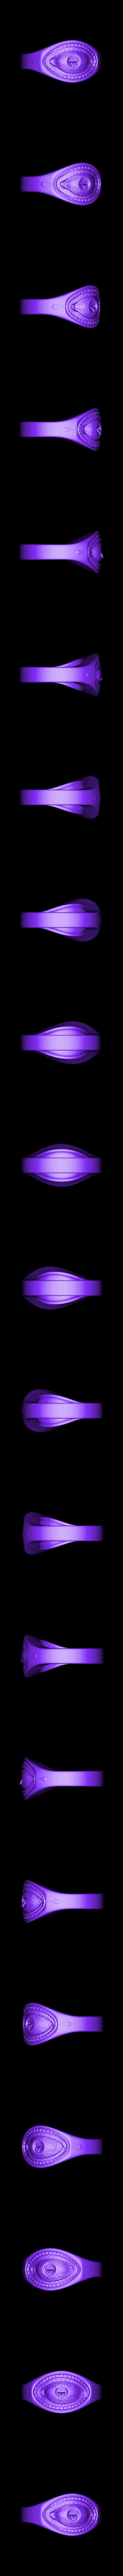 Grimace eye ring.stl Download STL file Grimace eye ring • 3D print object, MWopus